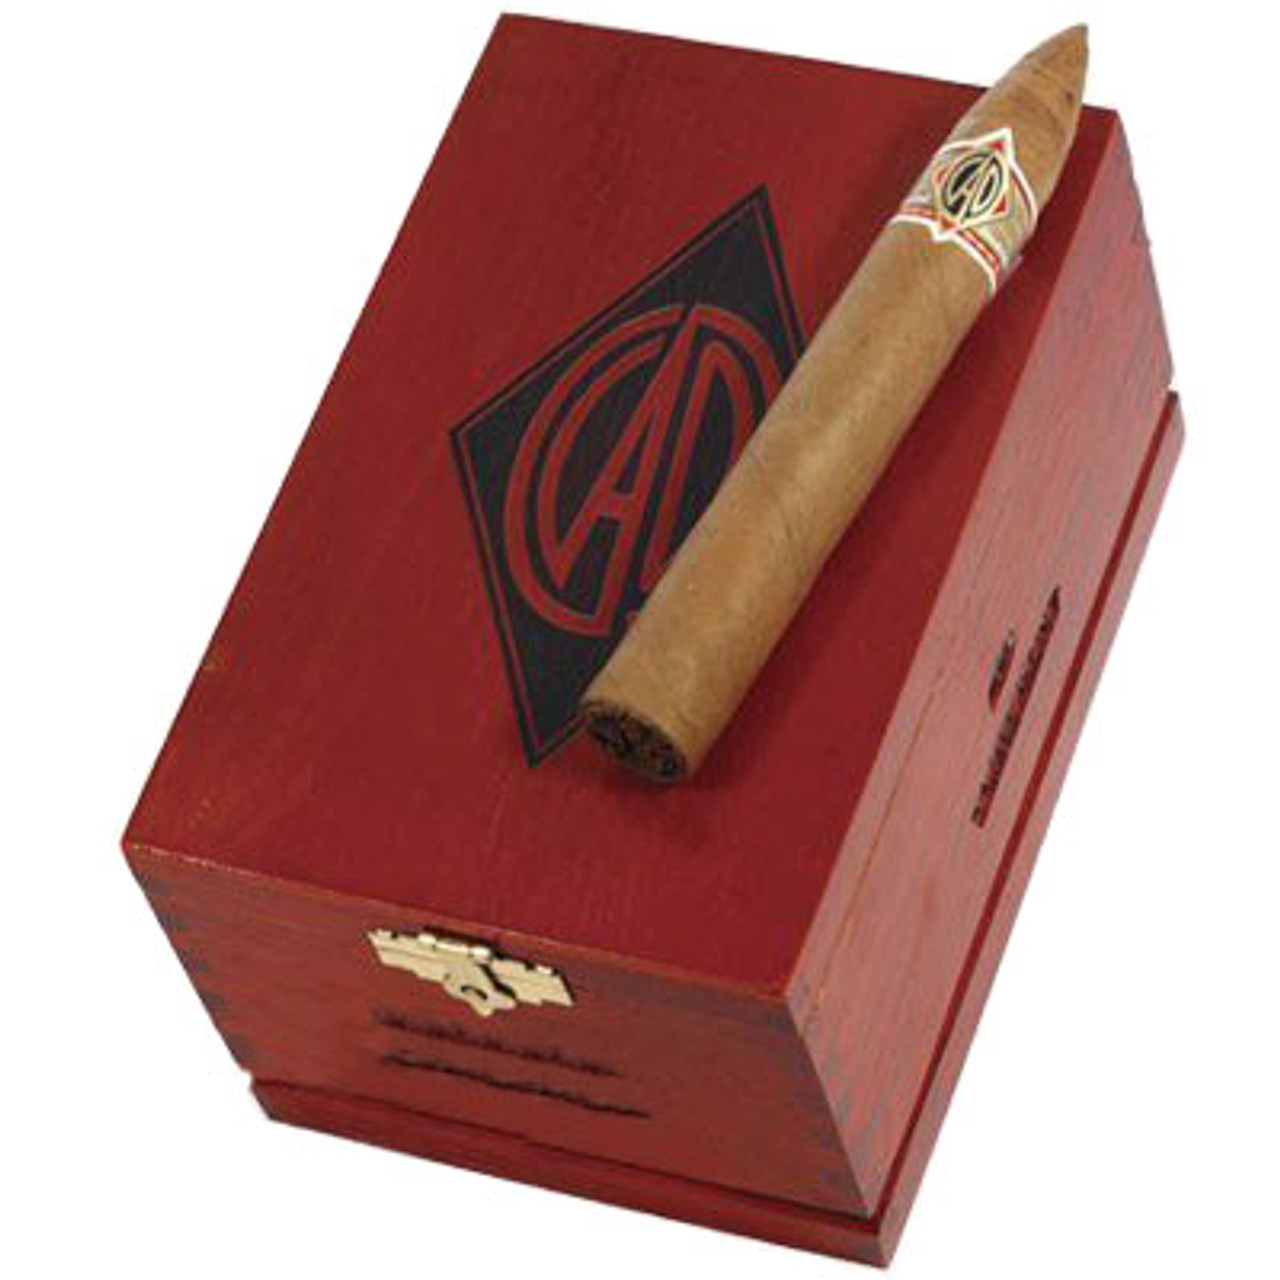 CAO Gold Torpedo Cigars - 6 1/4 x 52 (Box of 20)